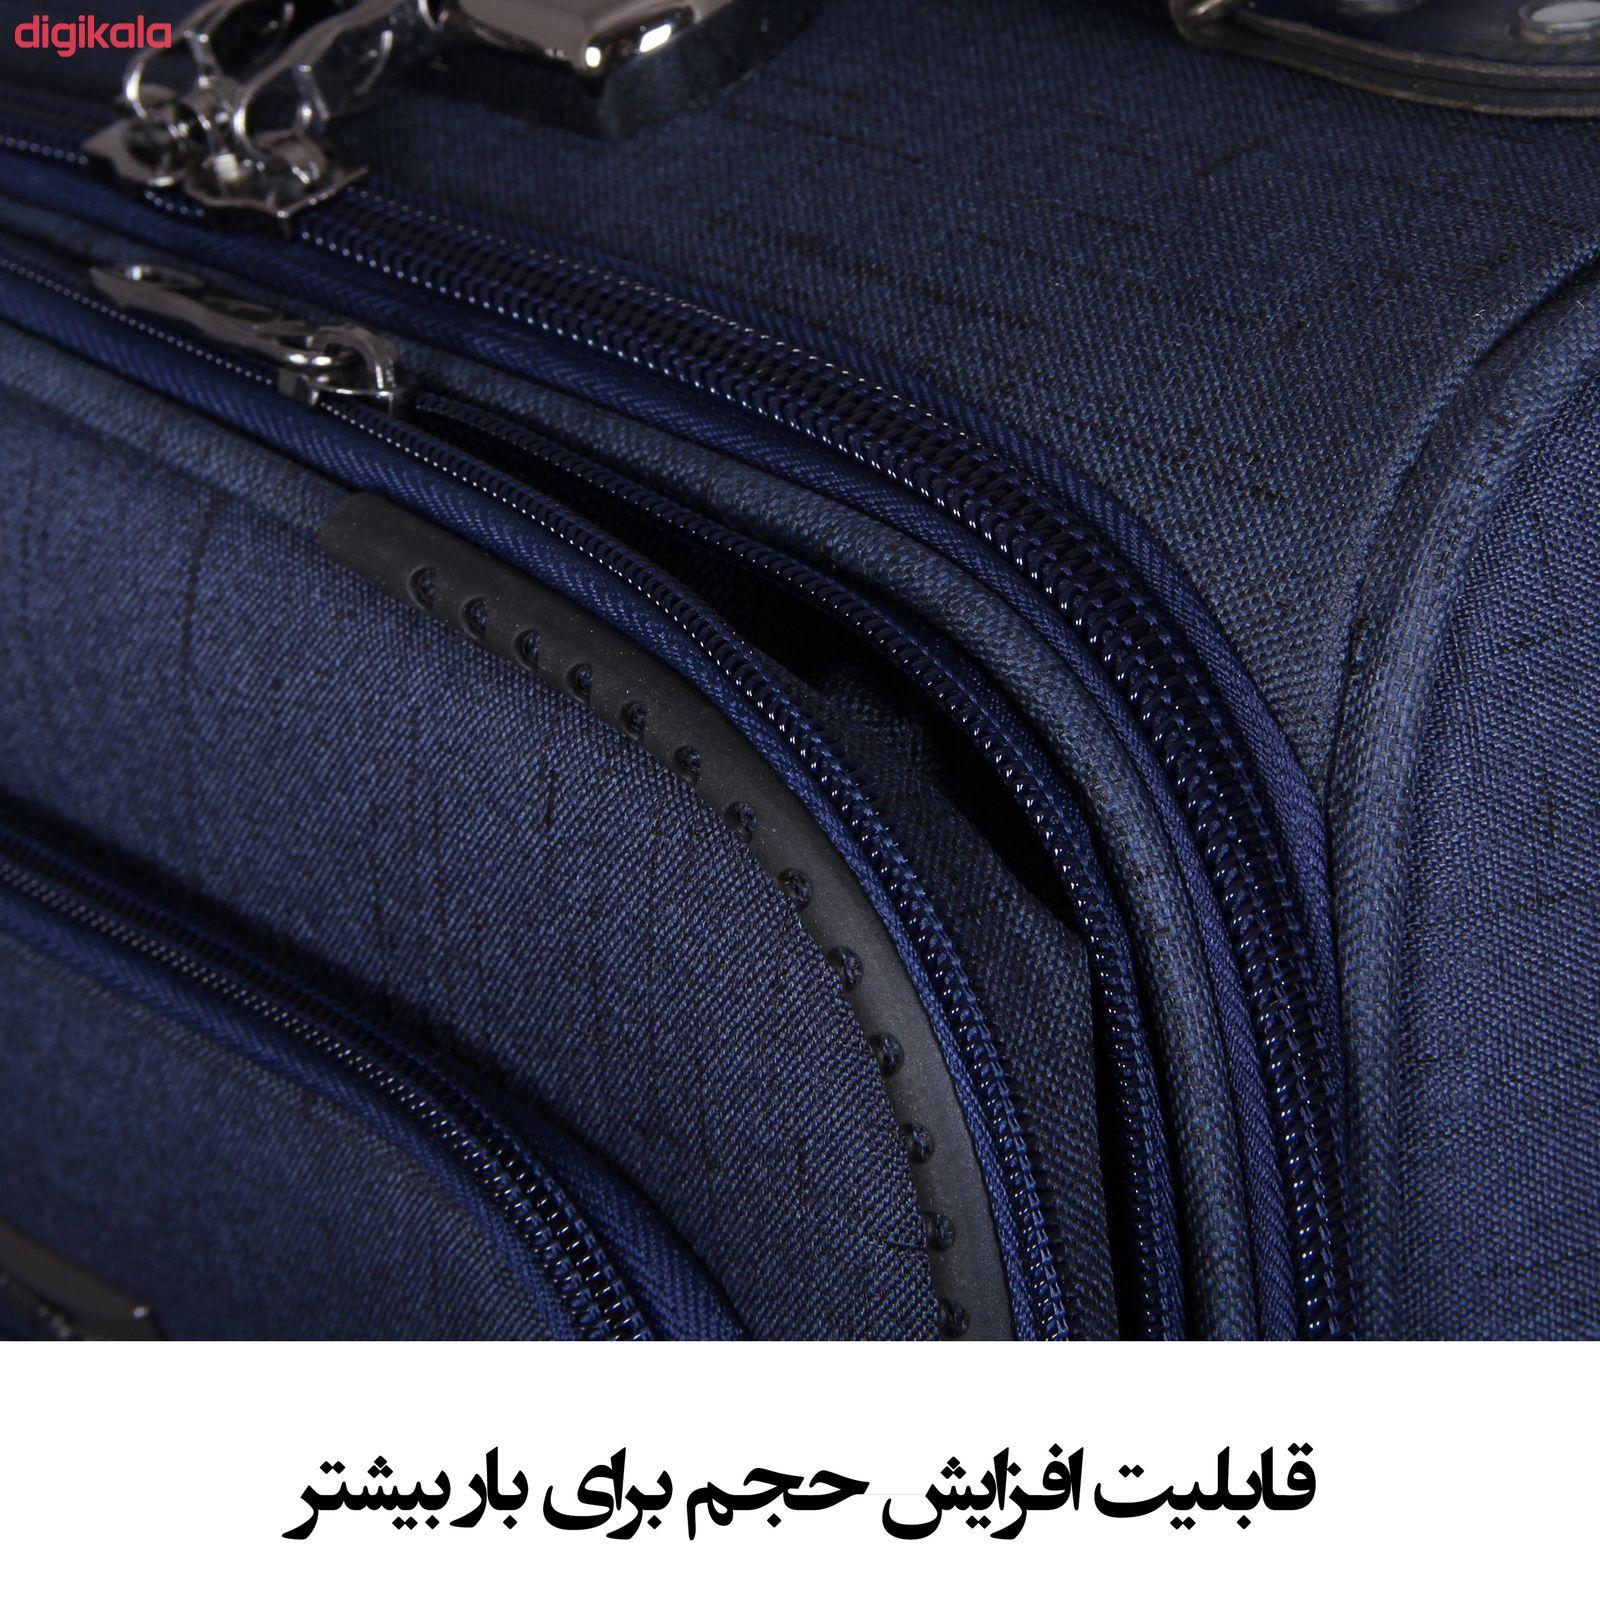 مجموعه سه عددی چمدان کد 2301A main 1 14